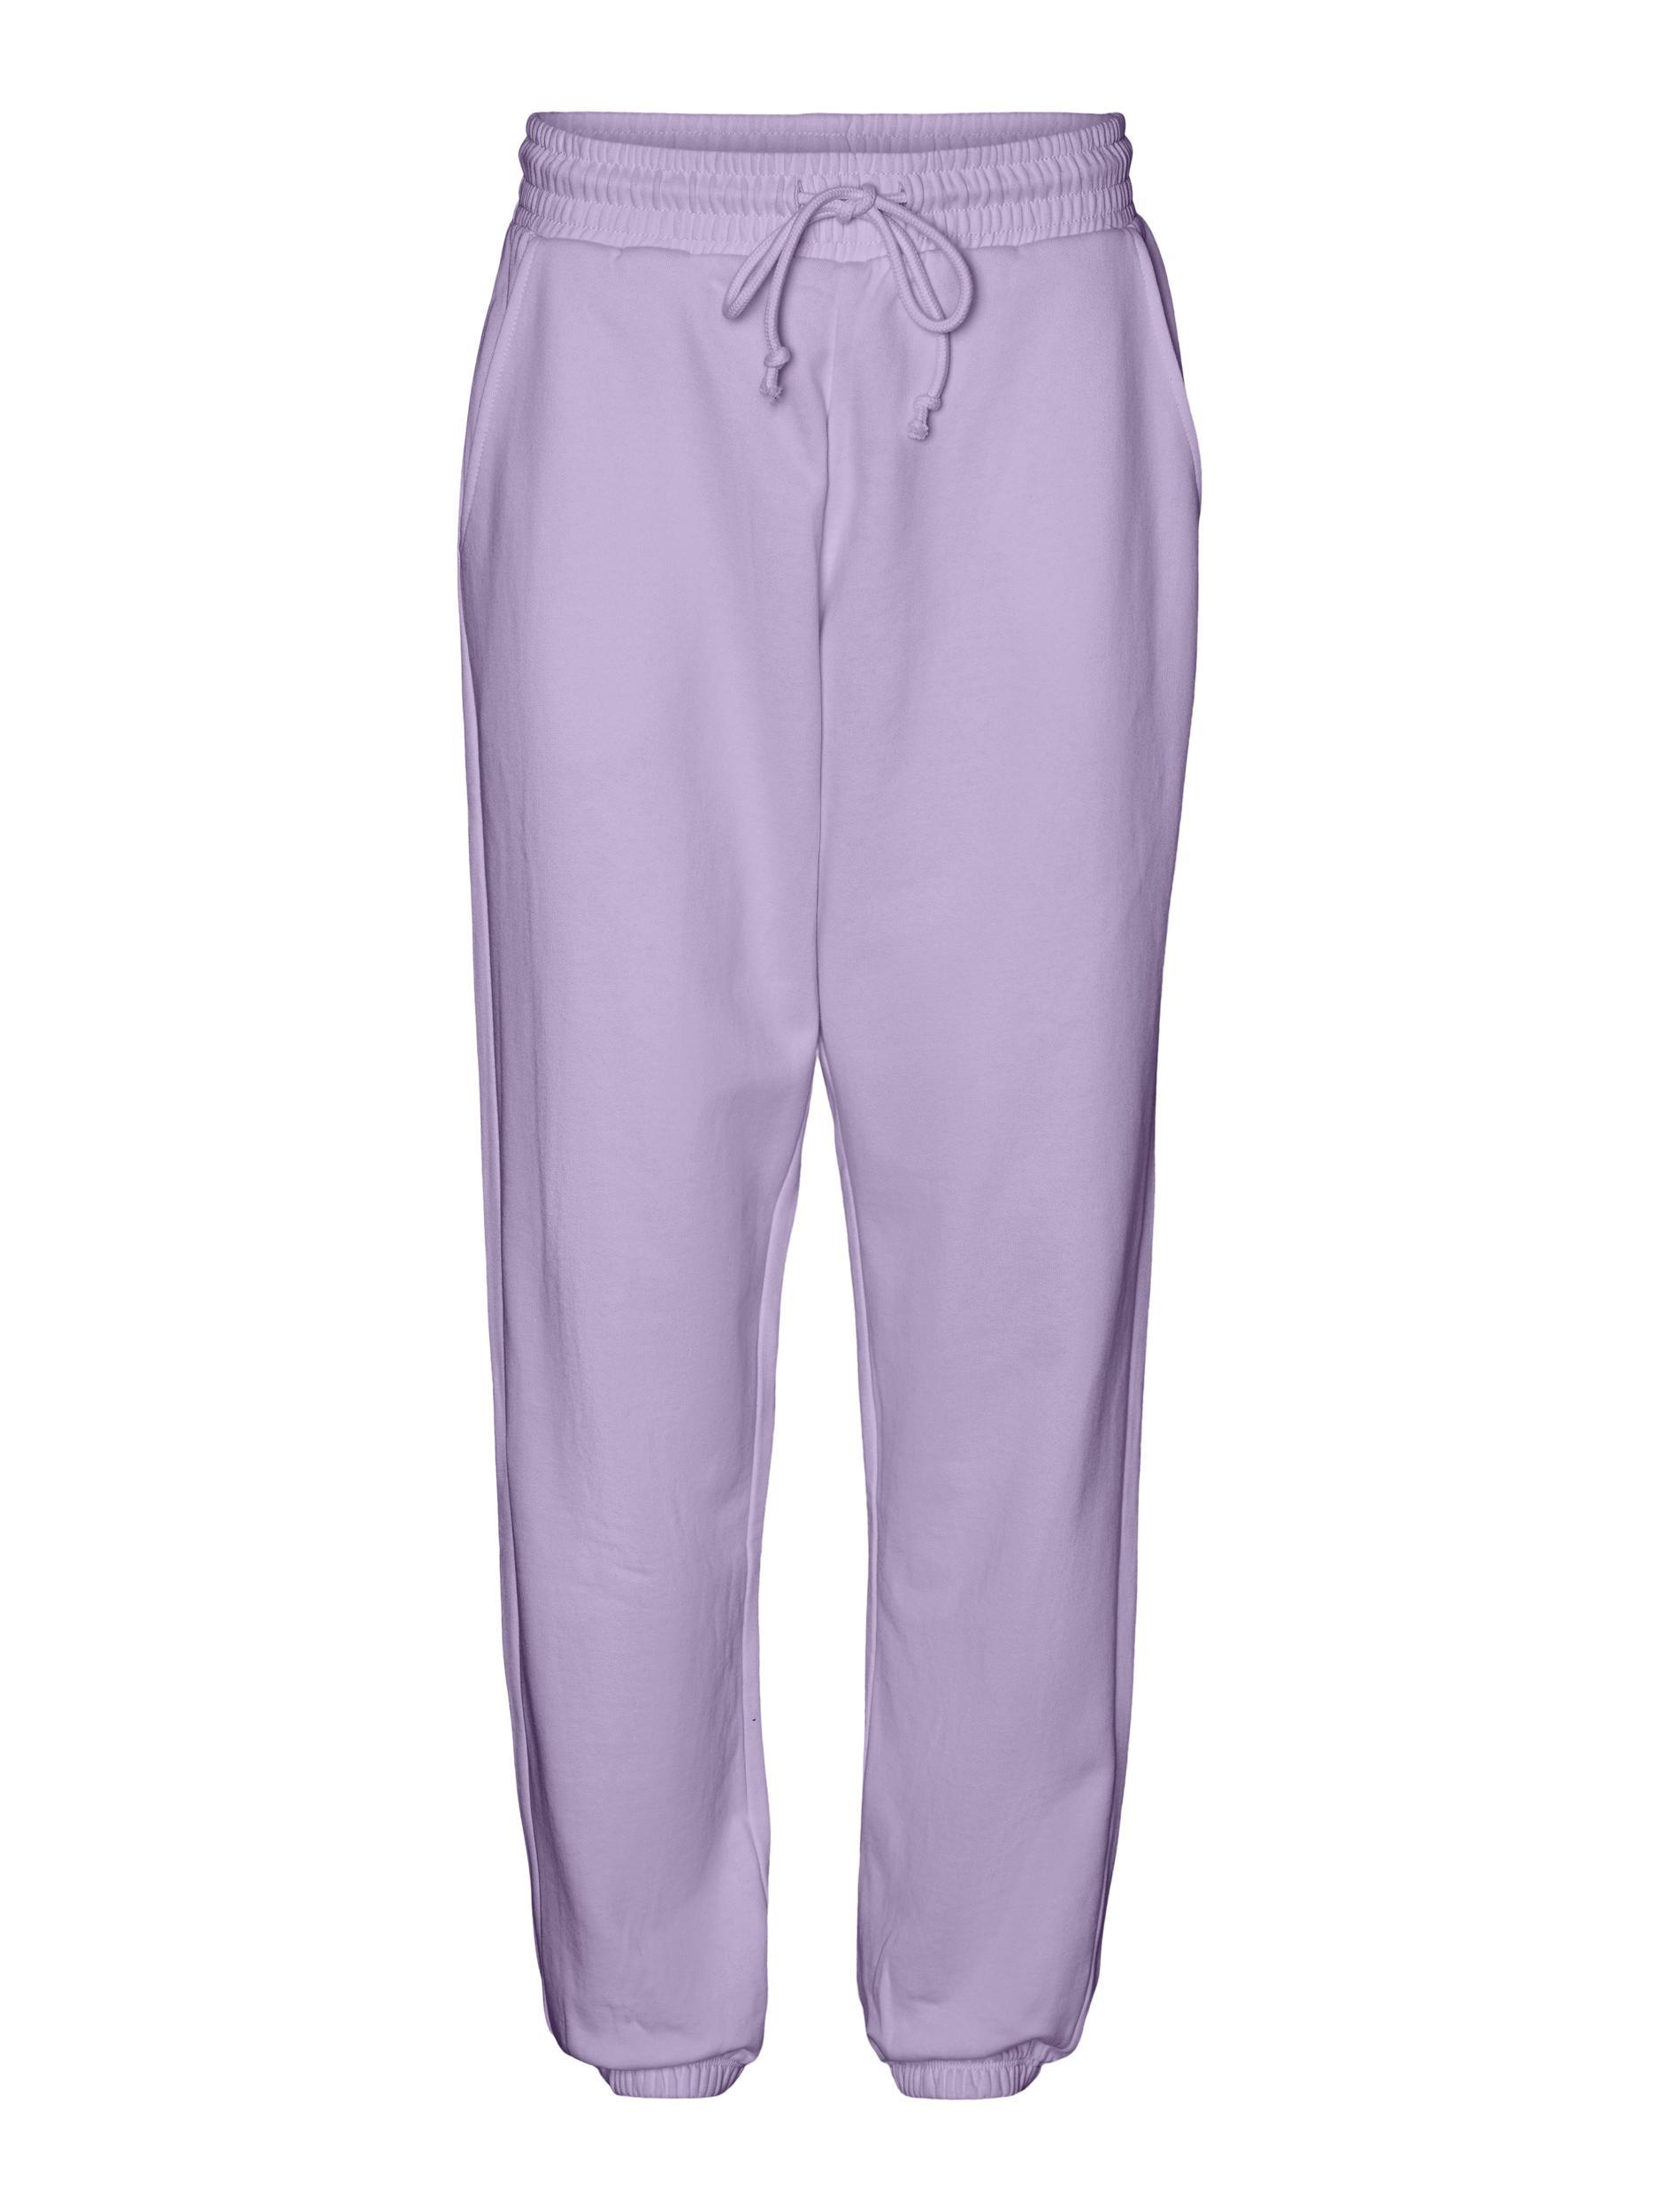 Vero Moda Oper HW sweatpants, pastel lilac, medium